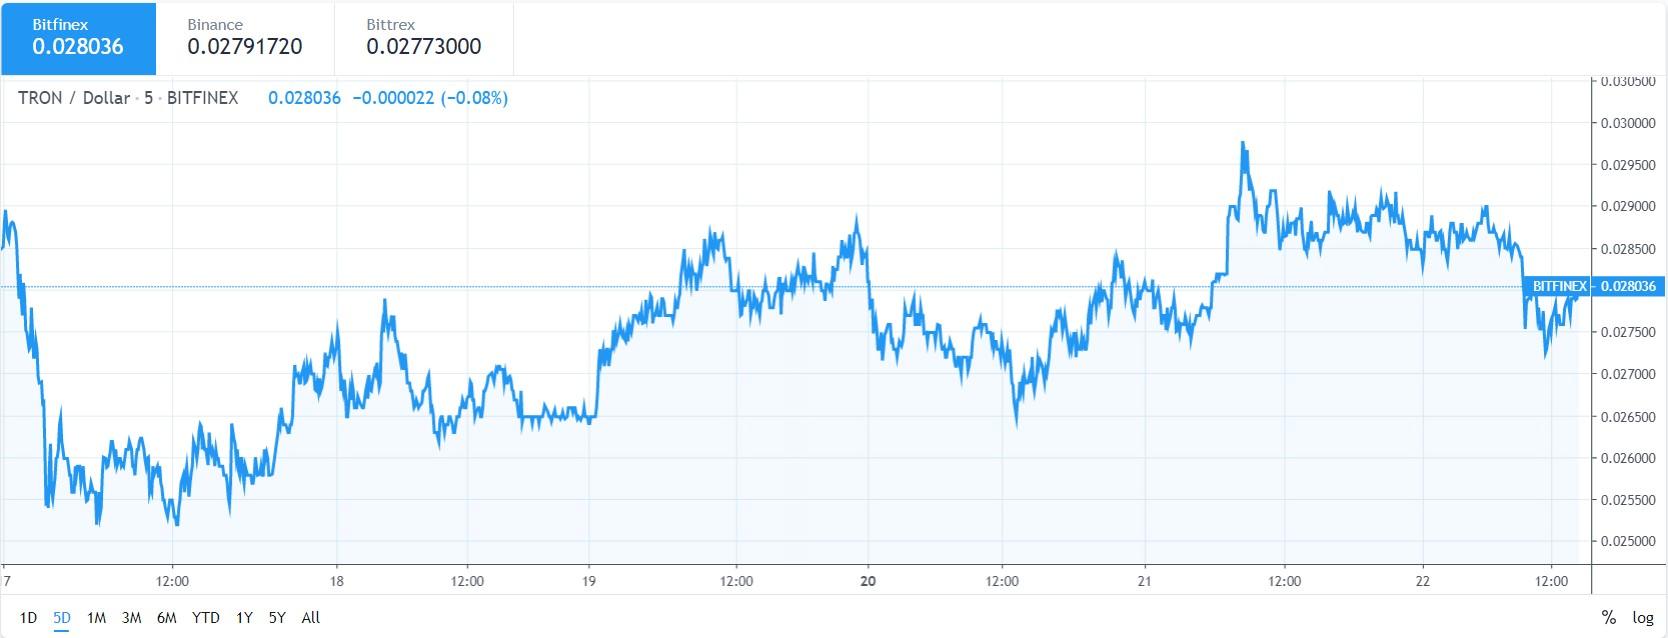 TRX price chart 22 may